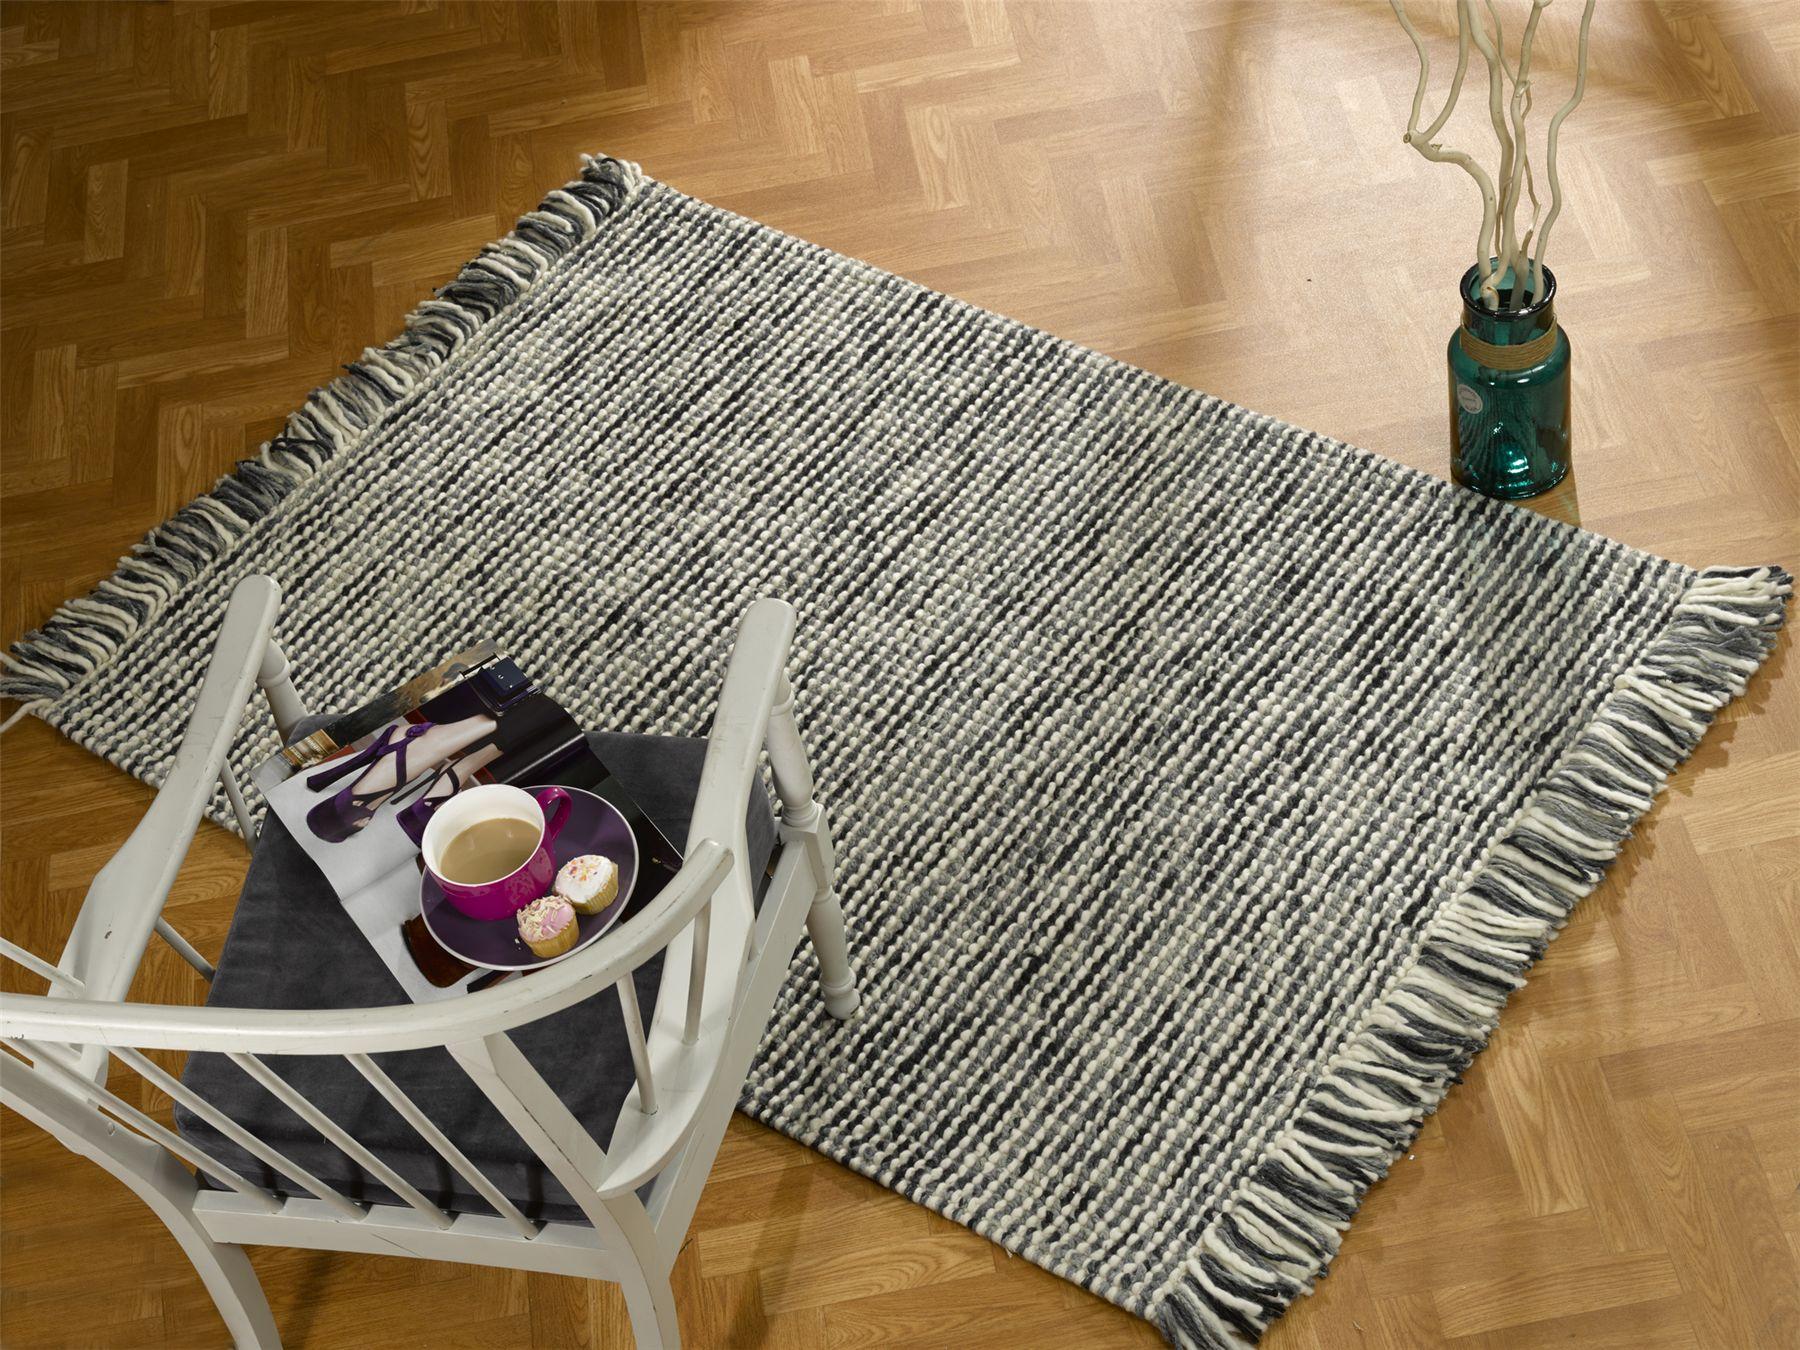 100 diy big rugs bestaudvdhome - 28 images - 100 diy big ...